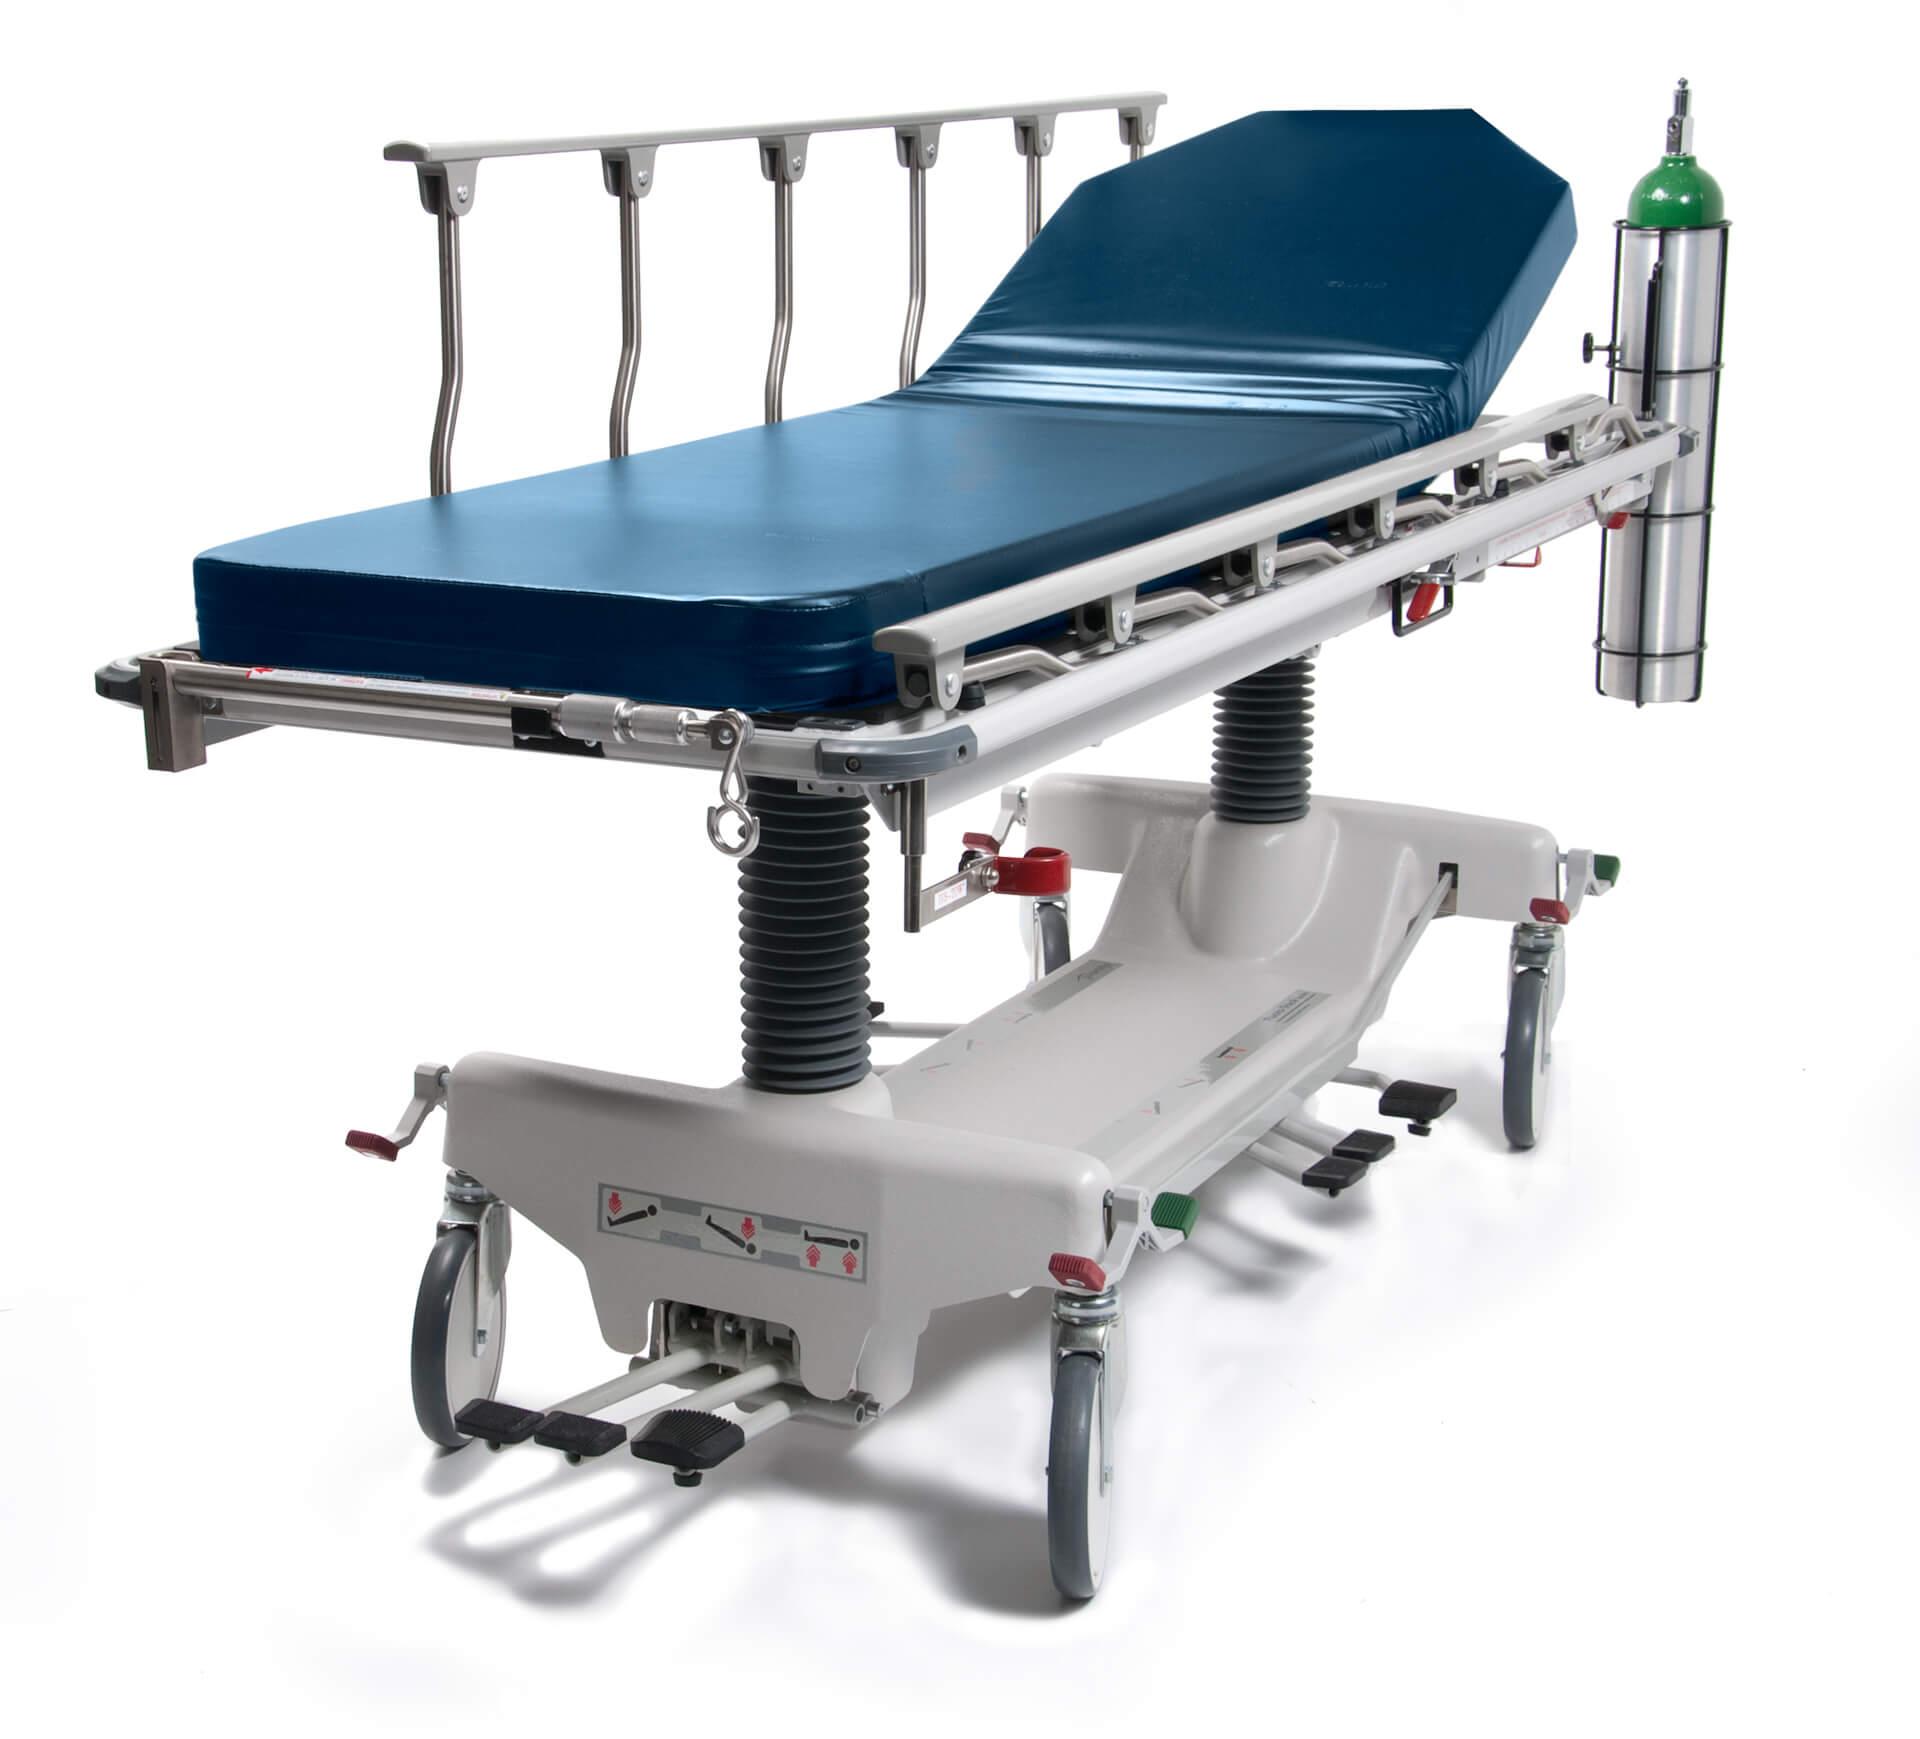 Fluroscopy Stretcher